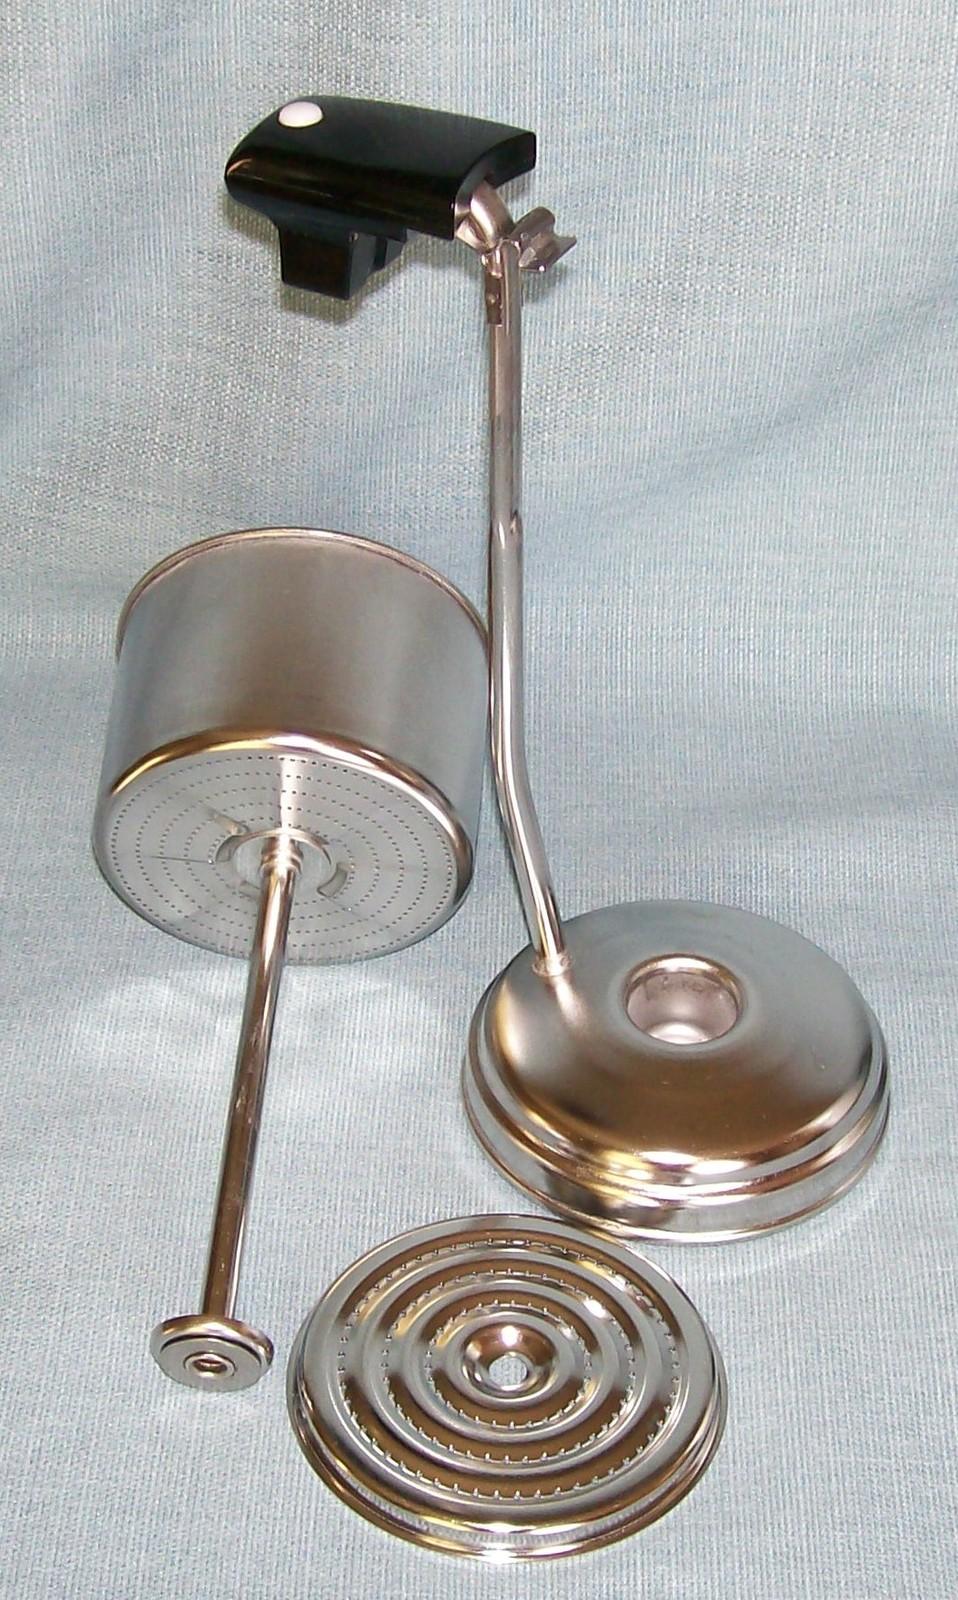 Corning Ware BLUE CORNFLOWER Electric Coffee Pot/Percolator 10 cup P-80-EP EUVC image 10